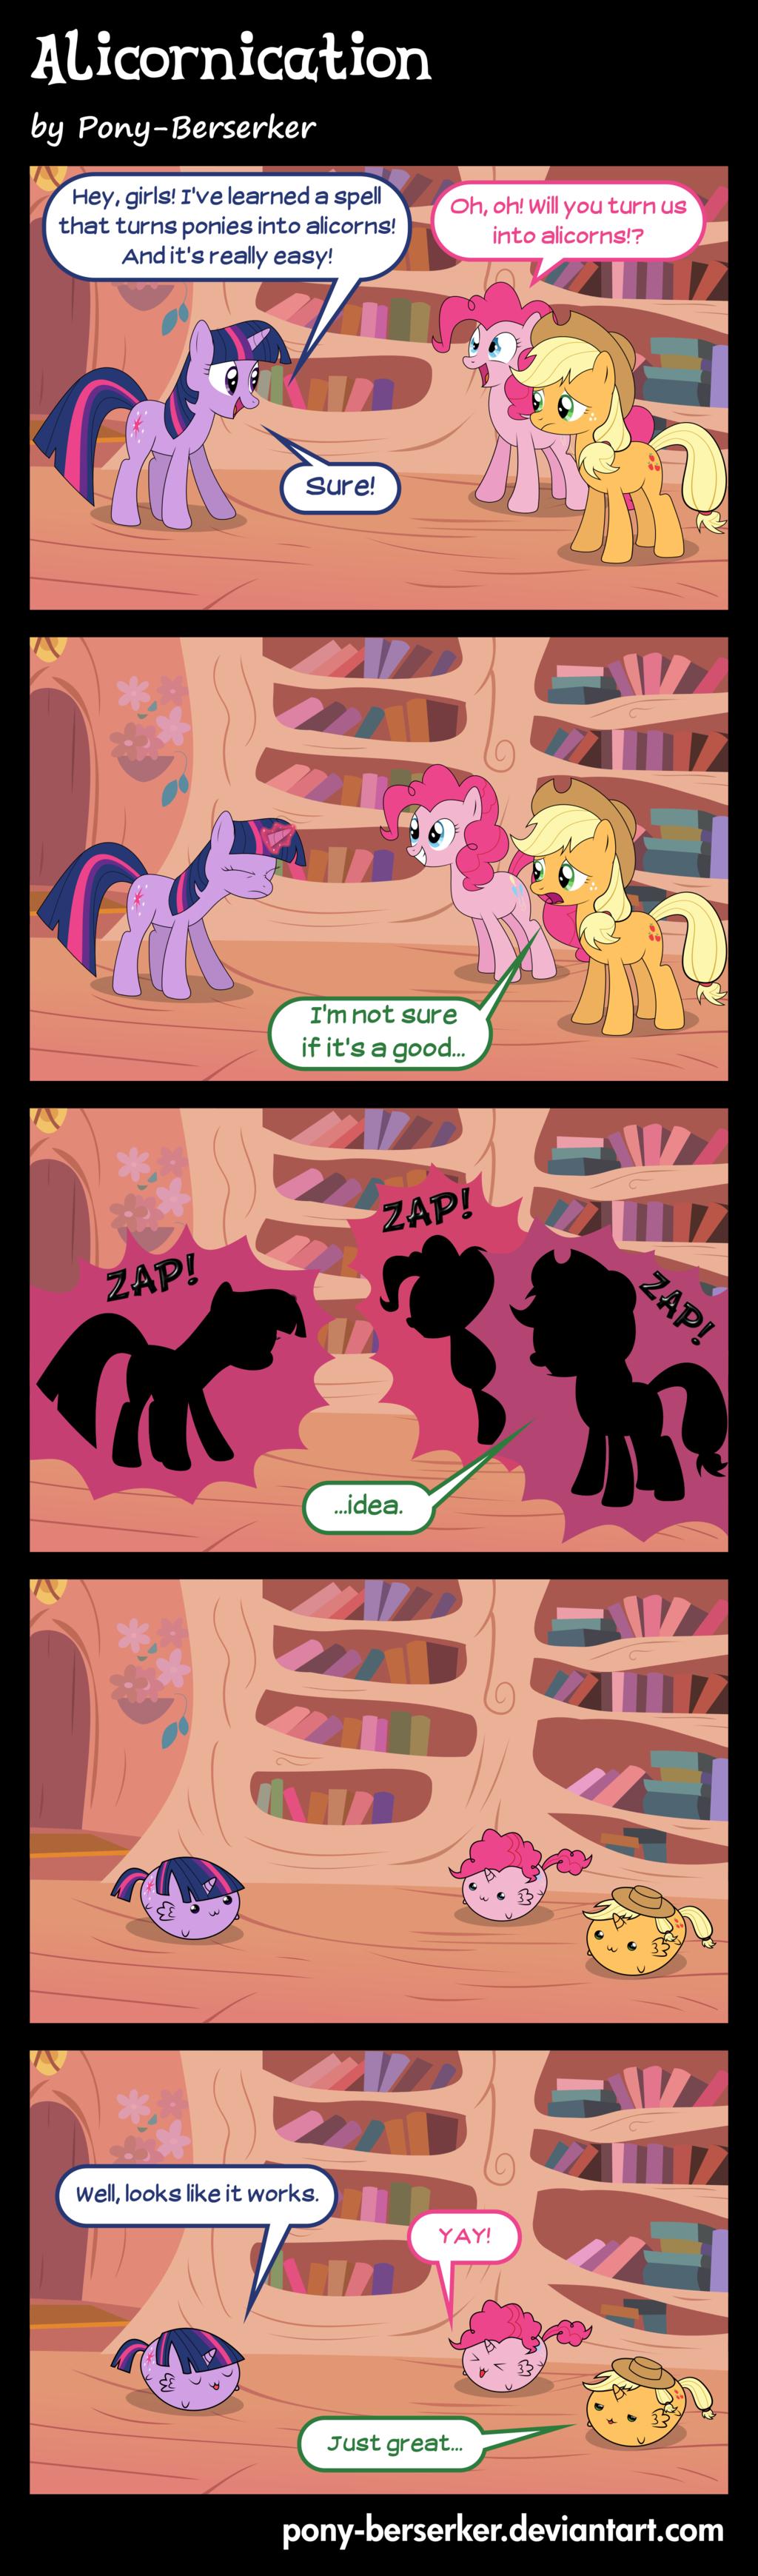 Alicornication. pony-berserker.deviantart.com/art/Ali..... I just had to. ponies comic